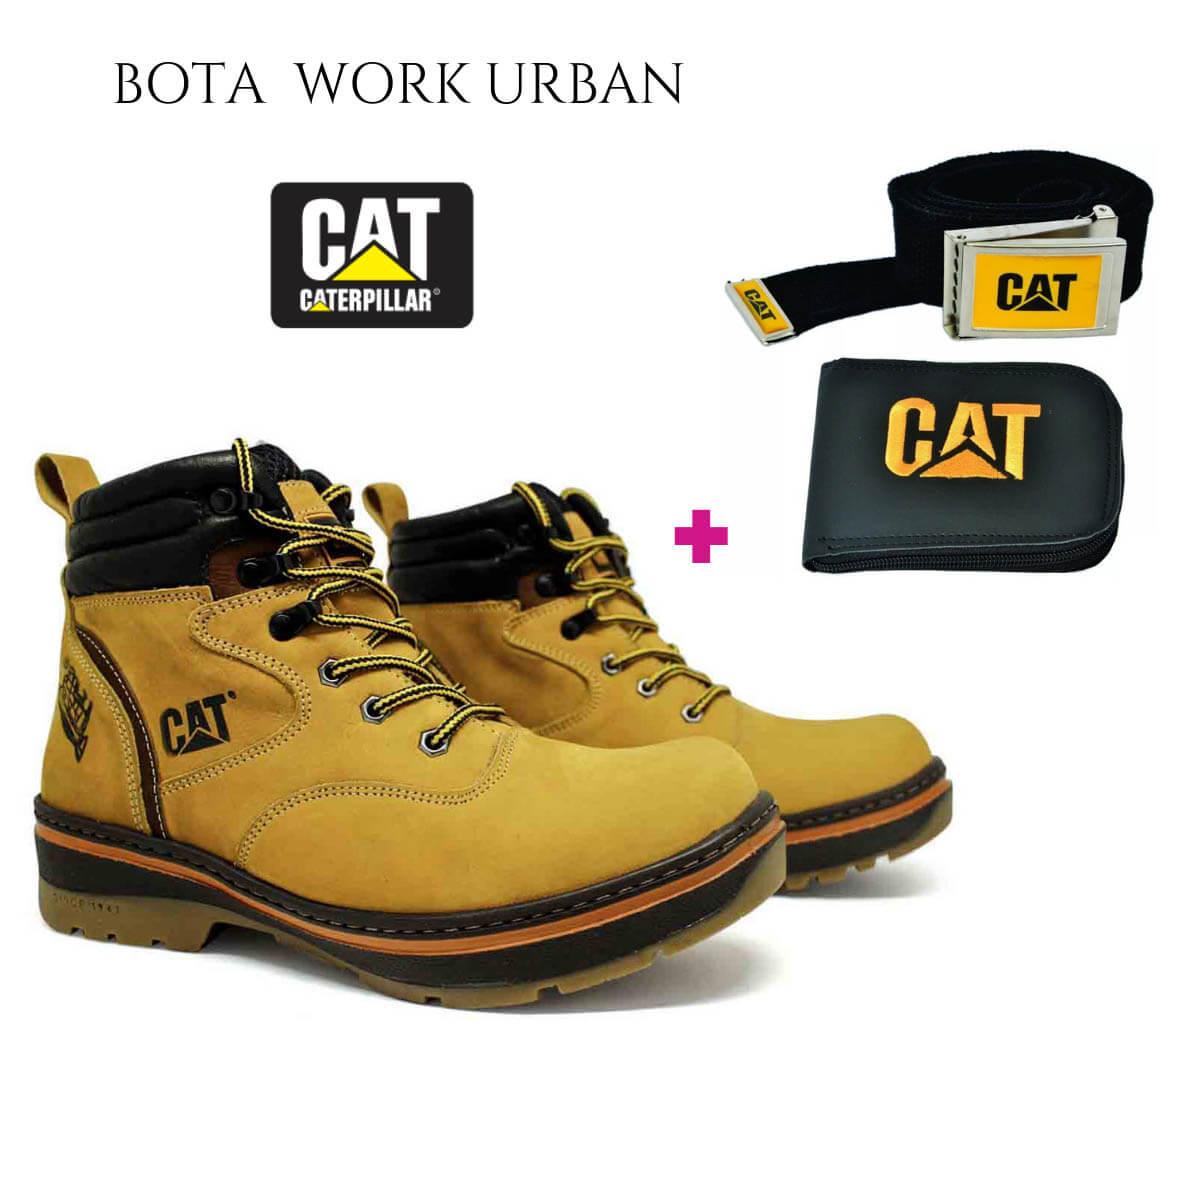 Kit Bota Coturno Work Urban 1000 Jeep Couro Yellow + Carteira e Cinto Cat